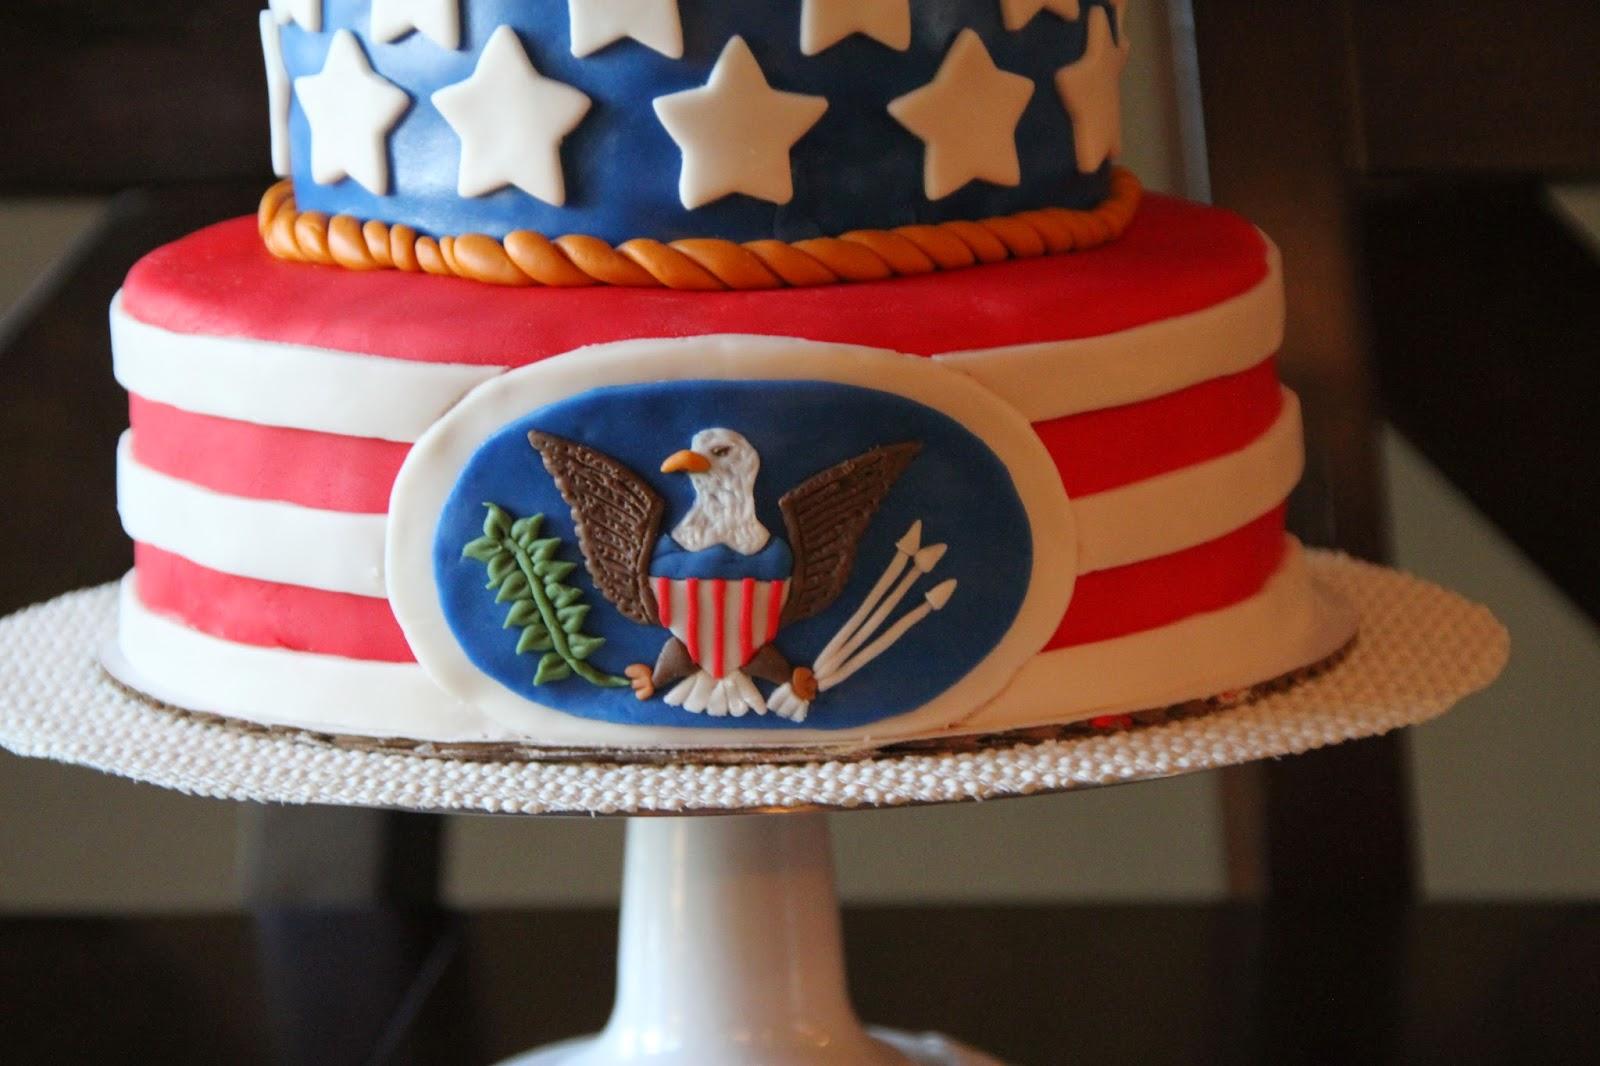 Happy Birthday President Lincoln Abraham Lincoln 16th